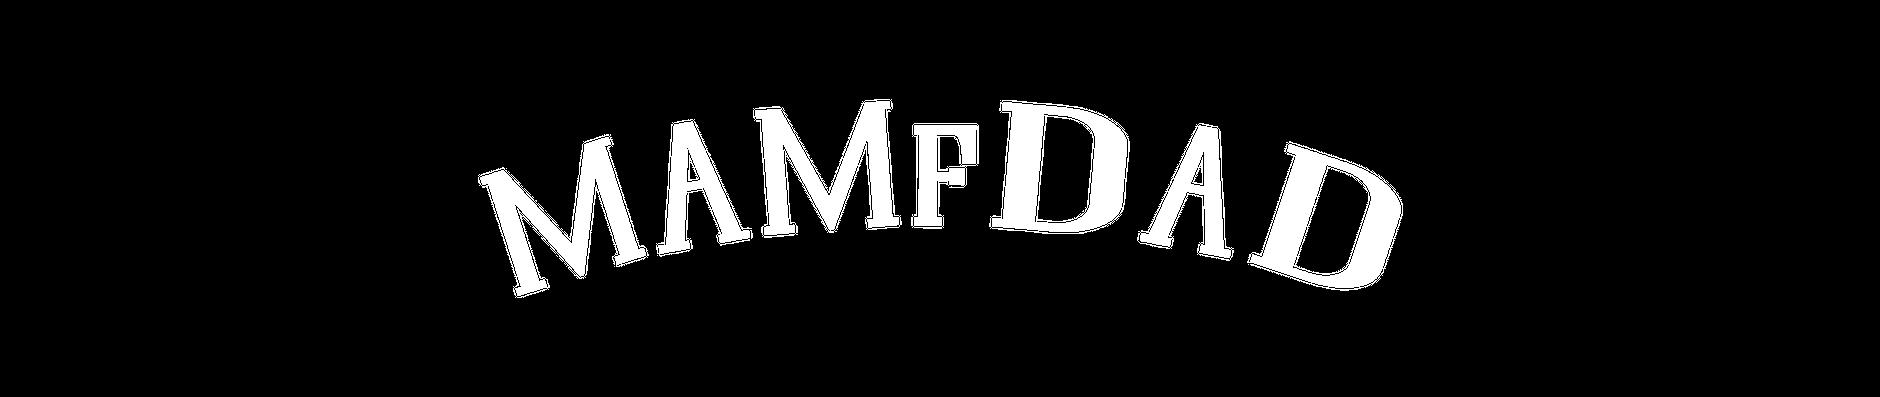 mamfdad